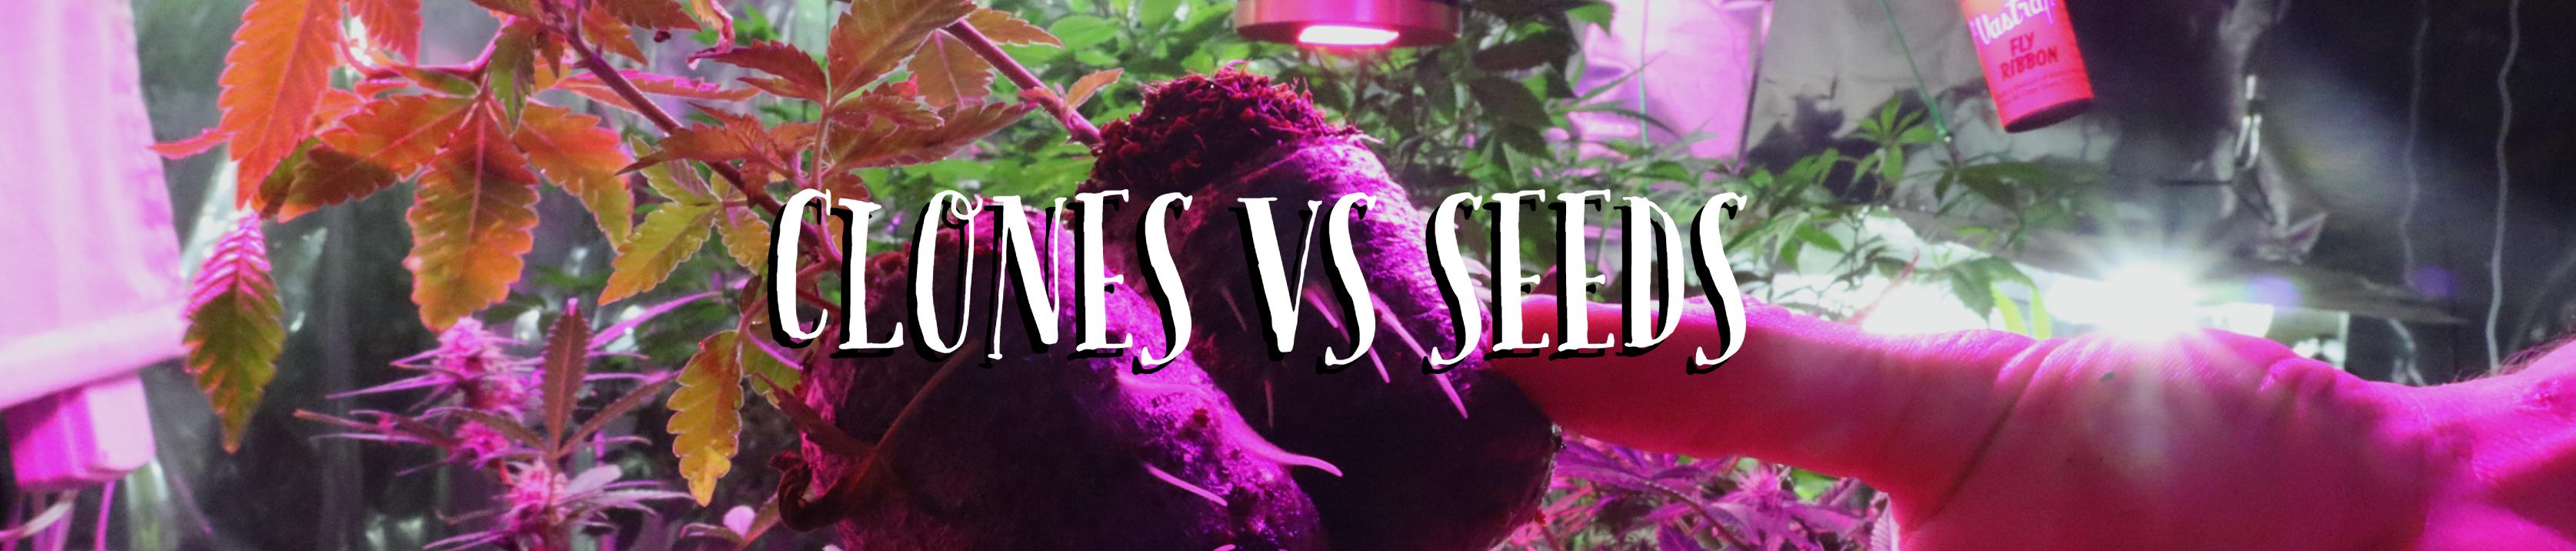 seeds vs clones